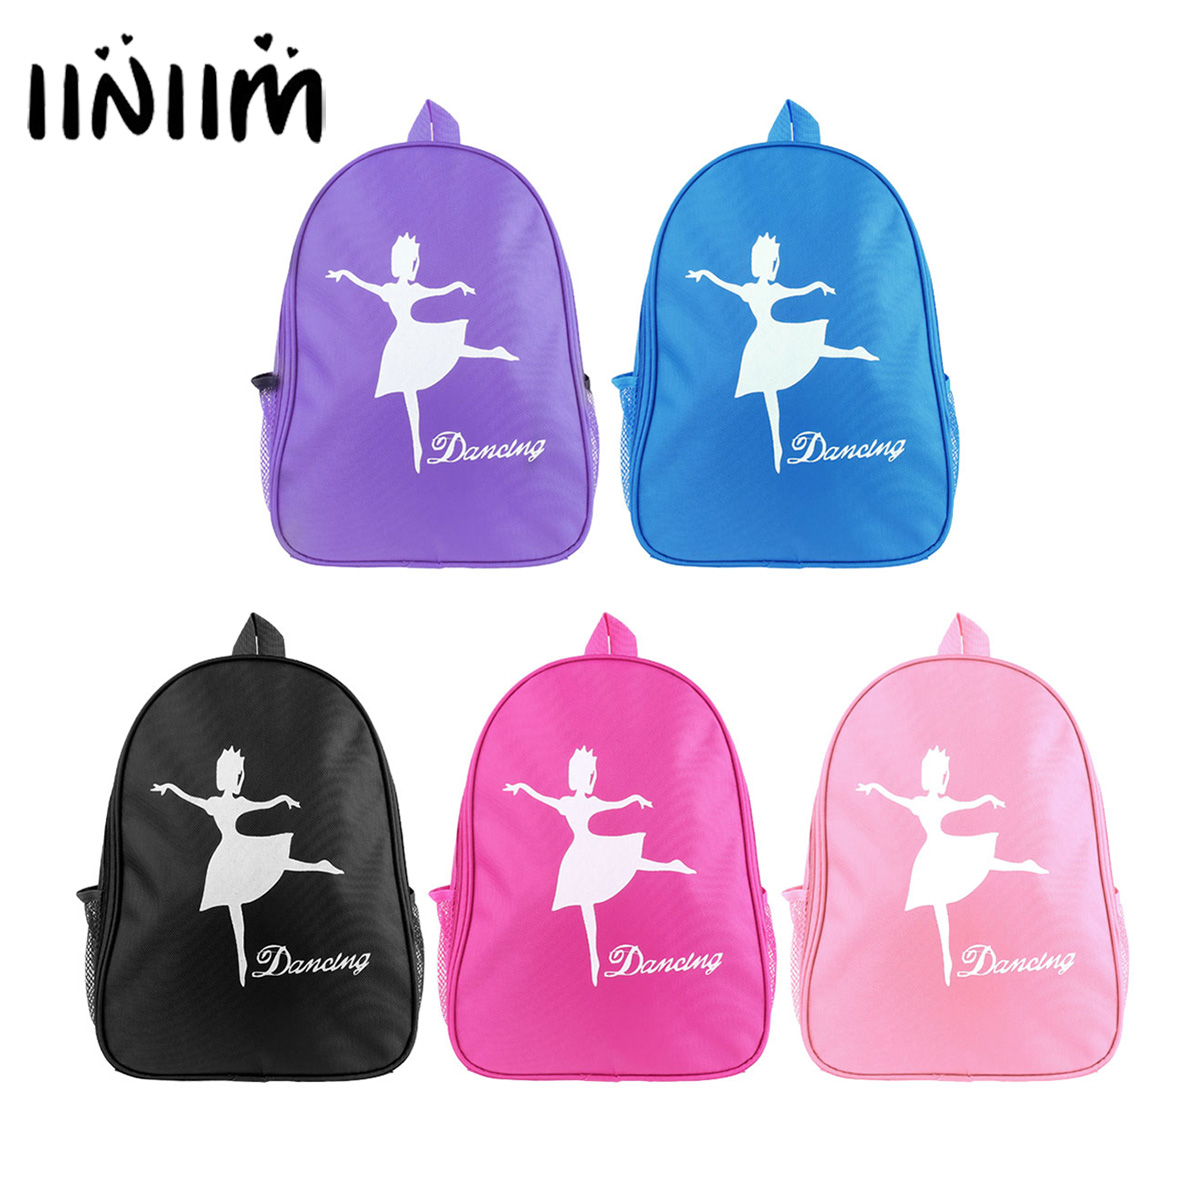 iiniim-kids-girls-lovely-fashion-font-b-ballet-b-font-dance-bag-students-school-backpack-font-b-ballet-b-font-dancing-girl-print-ballerina-shoulder-bag